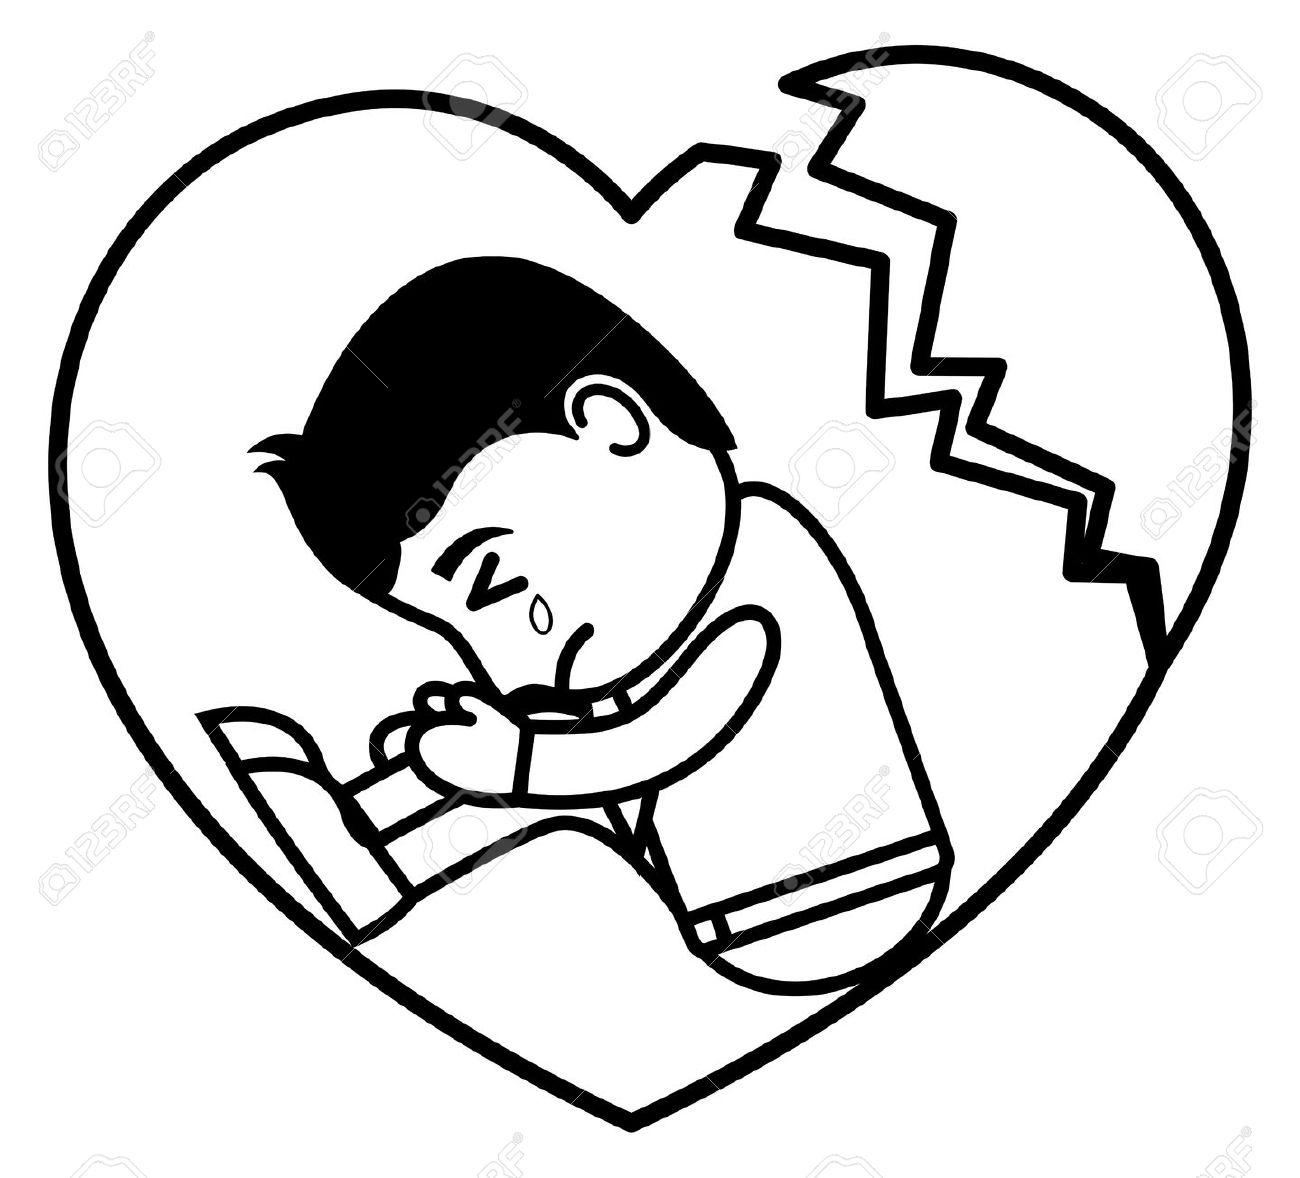 Sad Cartoons Images